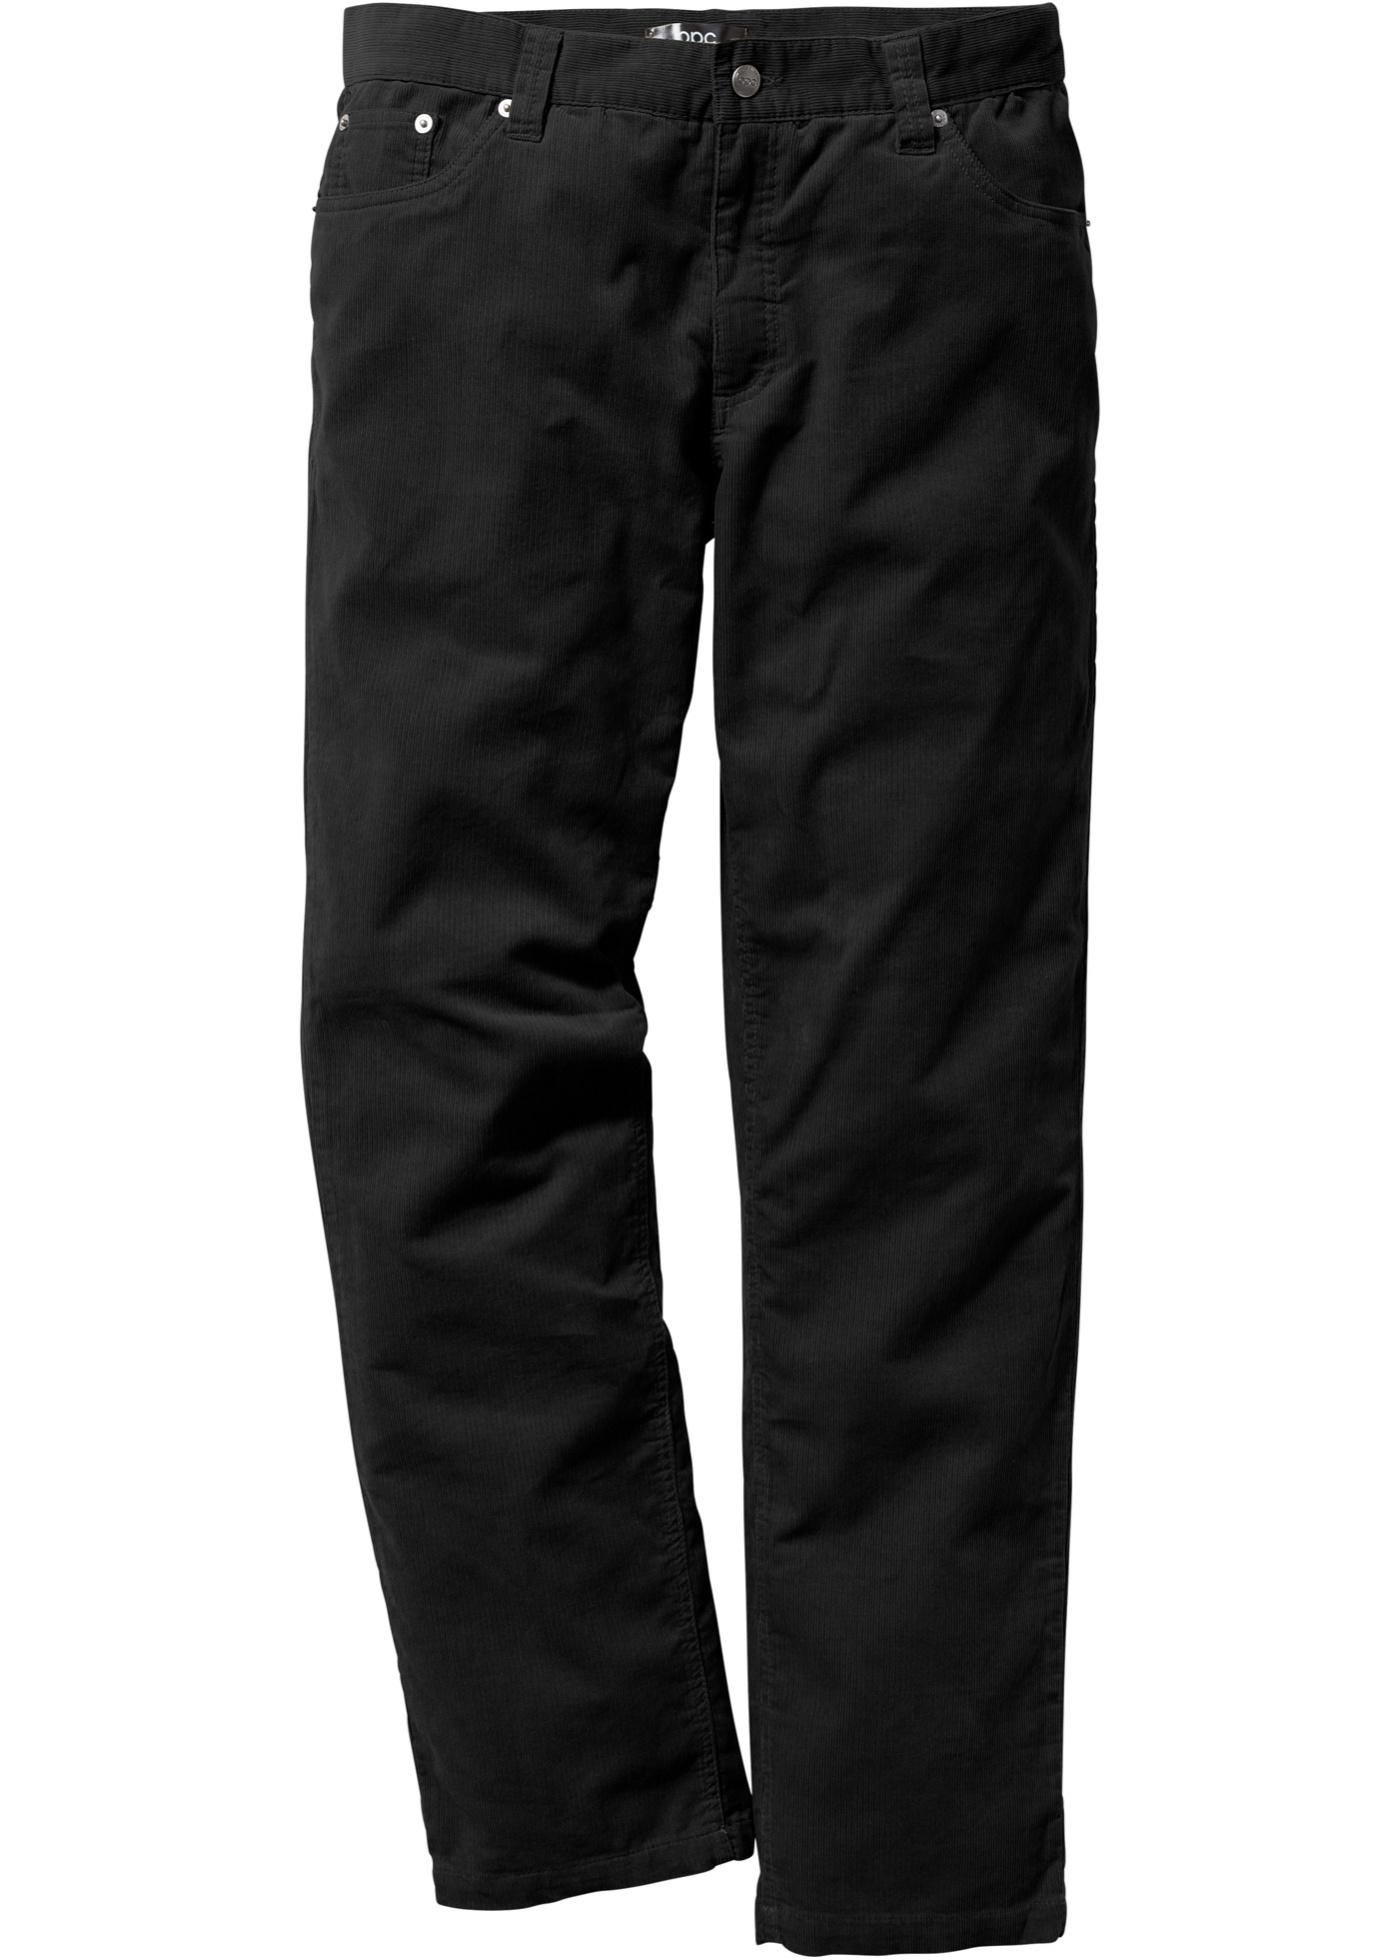 Pantalon velours cotele homme jusqu 86 pureshopping - Pantalon velours cotele homme ...